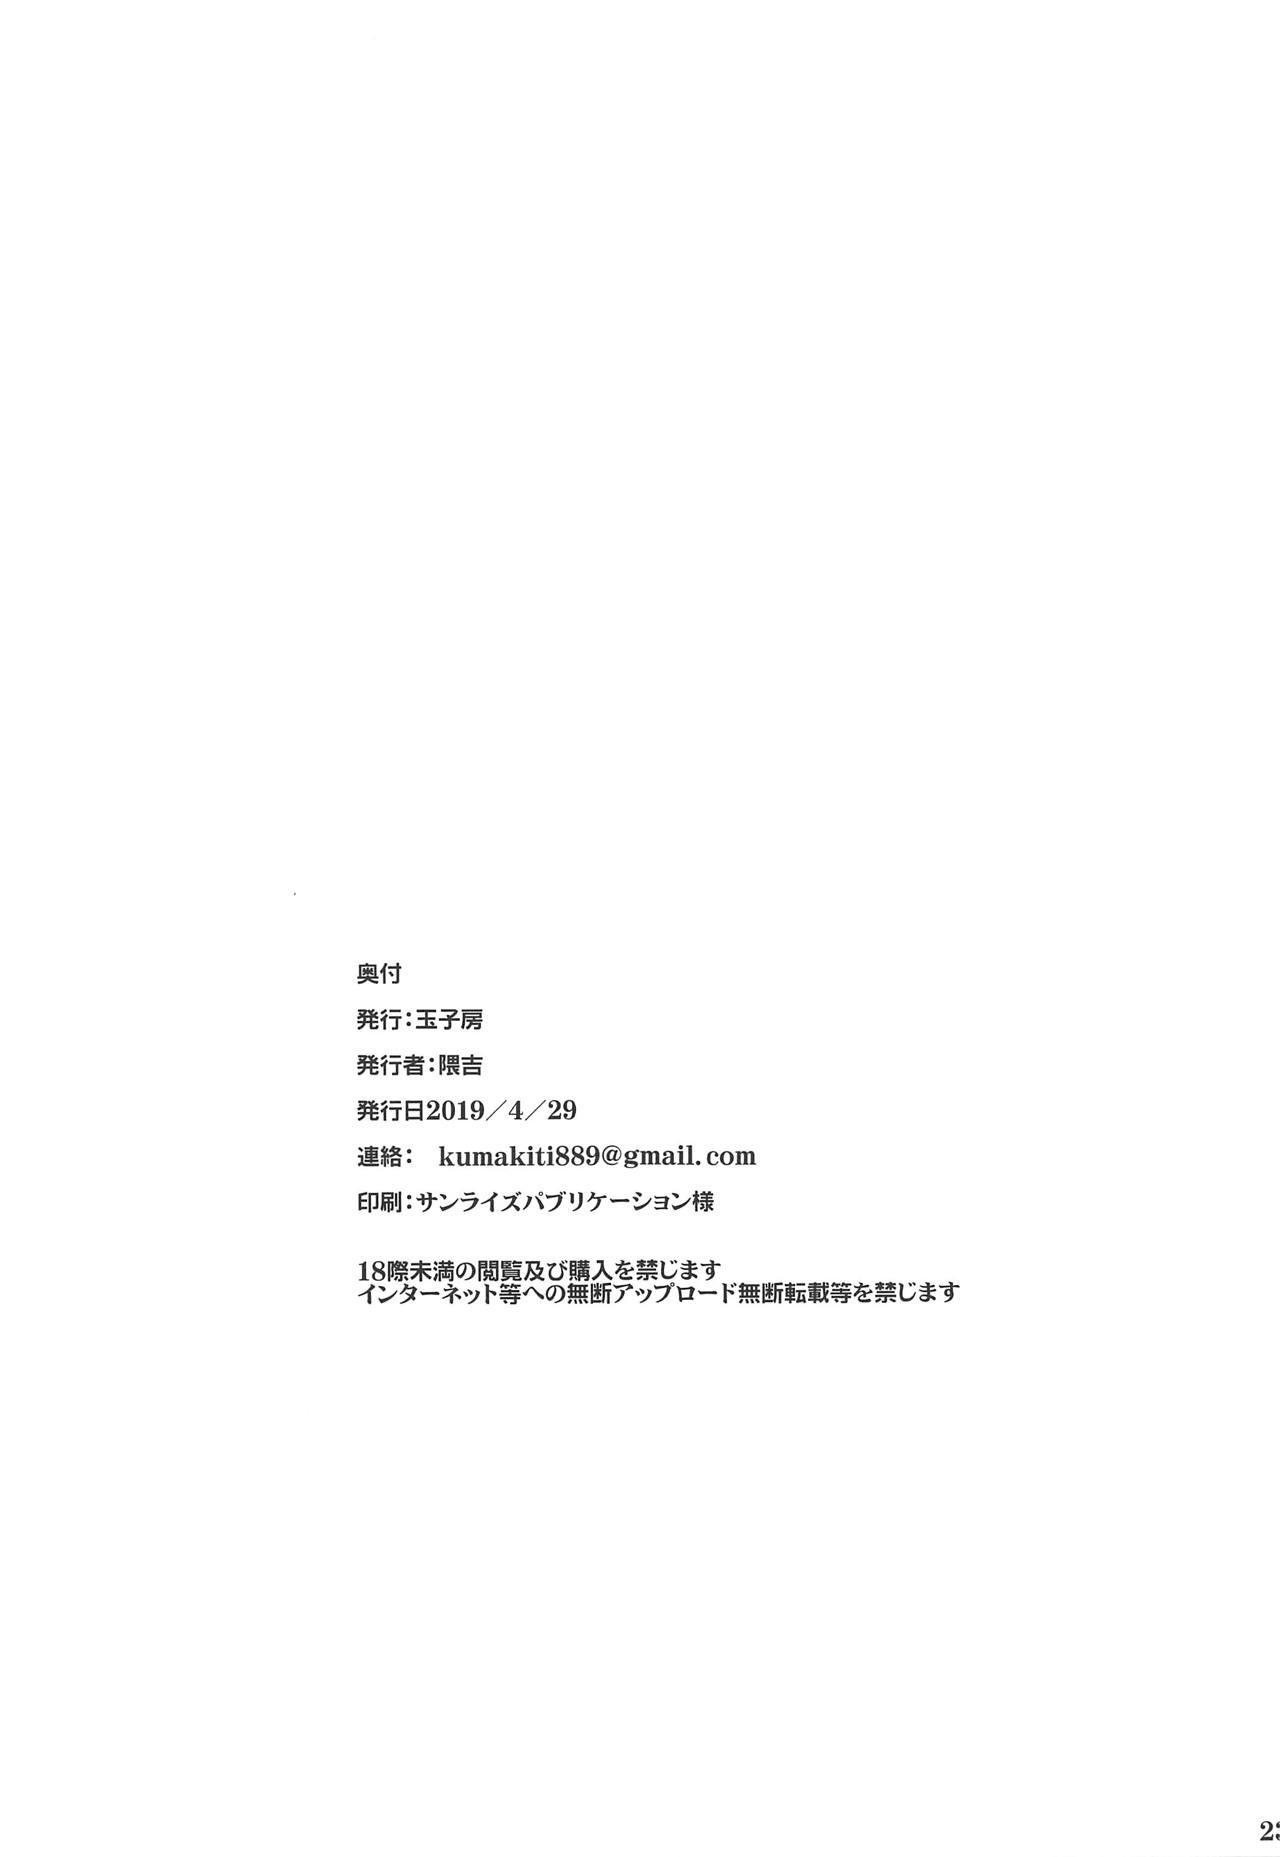 (COMIC1☆15) [Tamagobou (Kumakiti)] Musashi-chan Oji-san ni Kussuru (Fate/Grand Order) [Chinese] [新桥月白日语社] 24